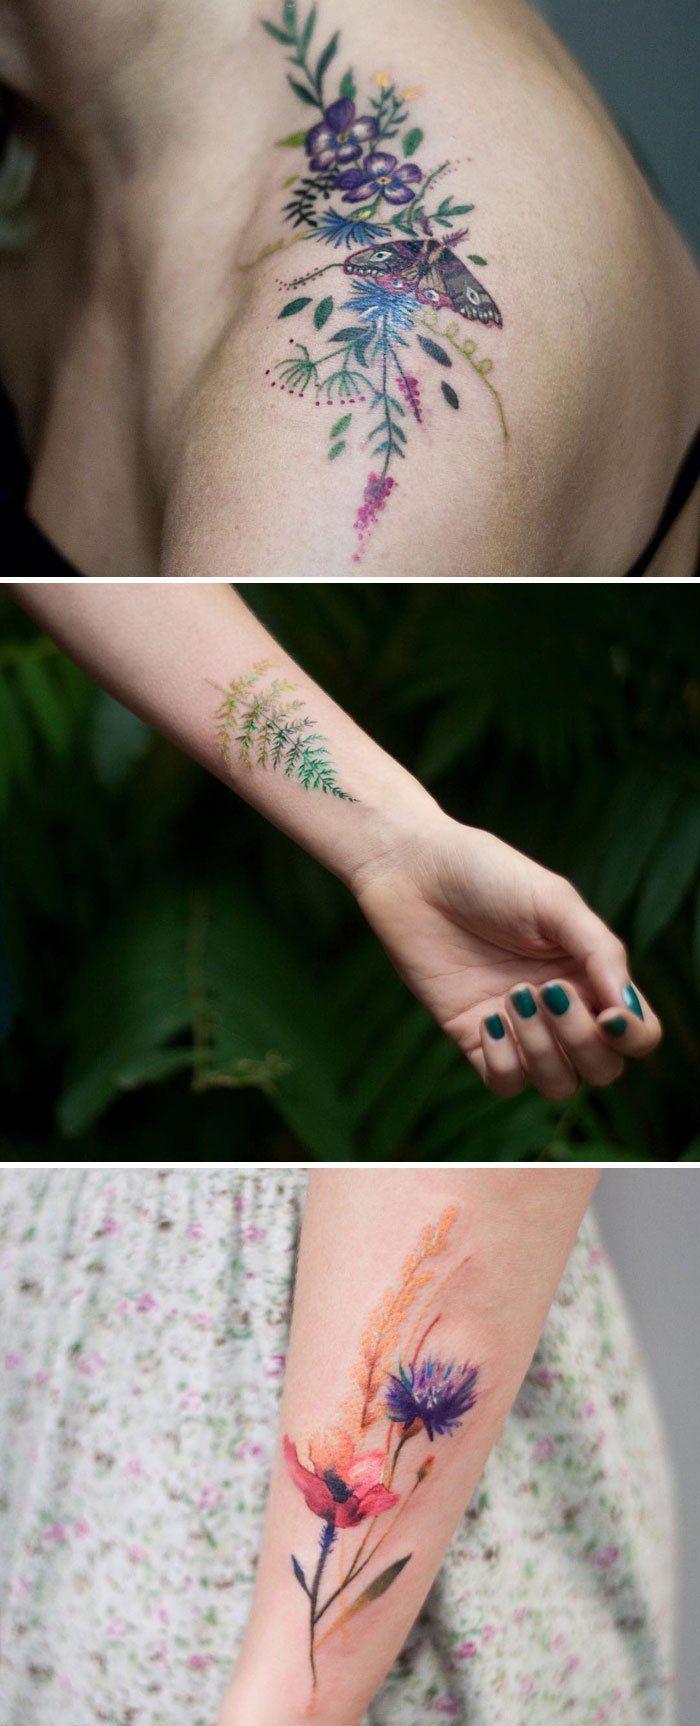 Tatuagem de flores [] #<br/> # #Plant #Tattoo,<br/> # #Wildflower #Tattoo,<br/> # #Nature #Tattoos,<br/> # #Floral #Tattoos,<br/> # #Tattoo #Time,<br/> # #Tattoo #Designs,<br/> # #Tattoo #Ideas,<br/> # #Tattoo #Artists,<br/> # #Tattoo #Inspiration<br/>